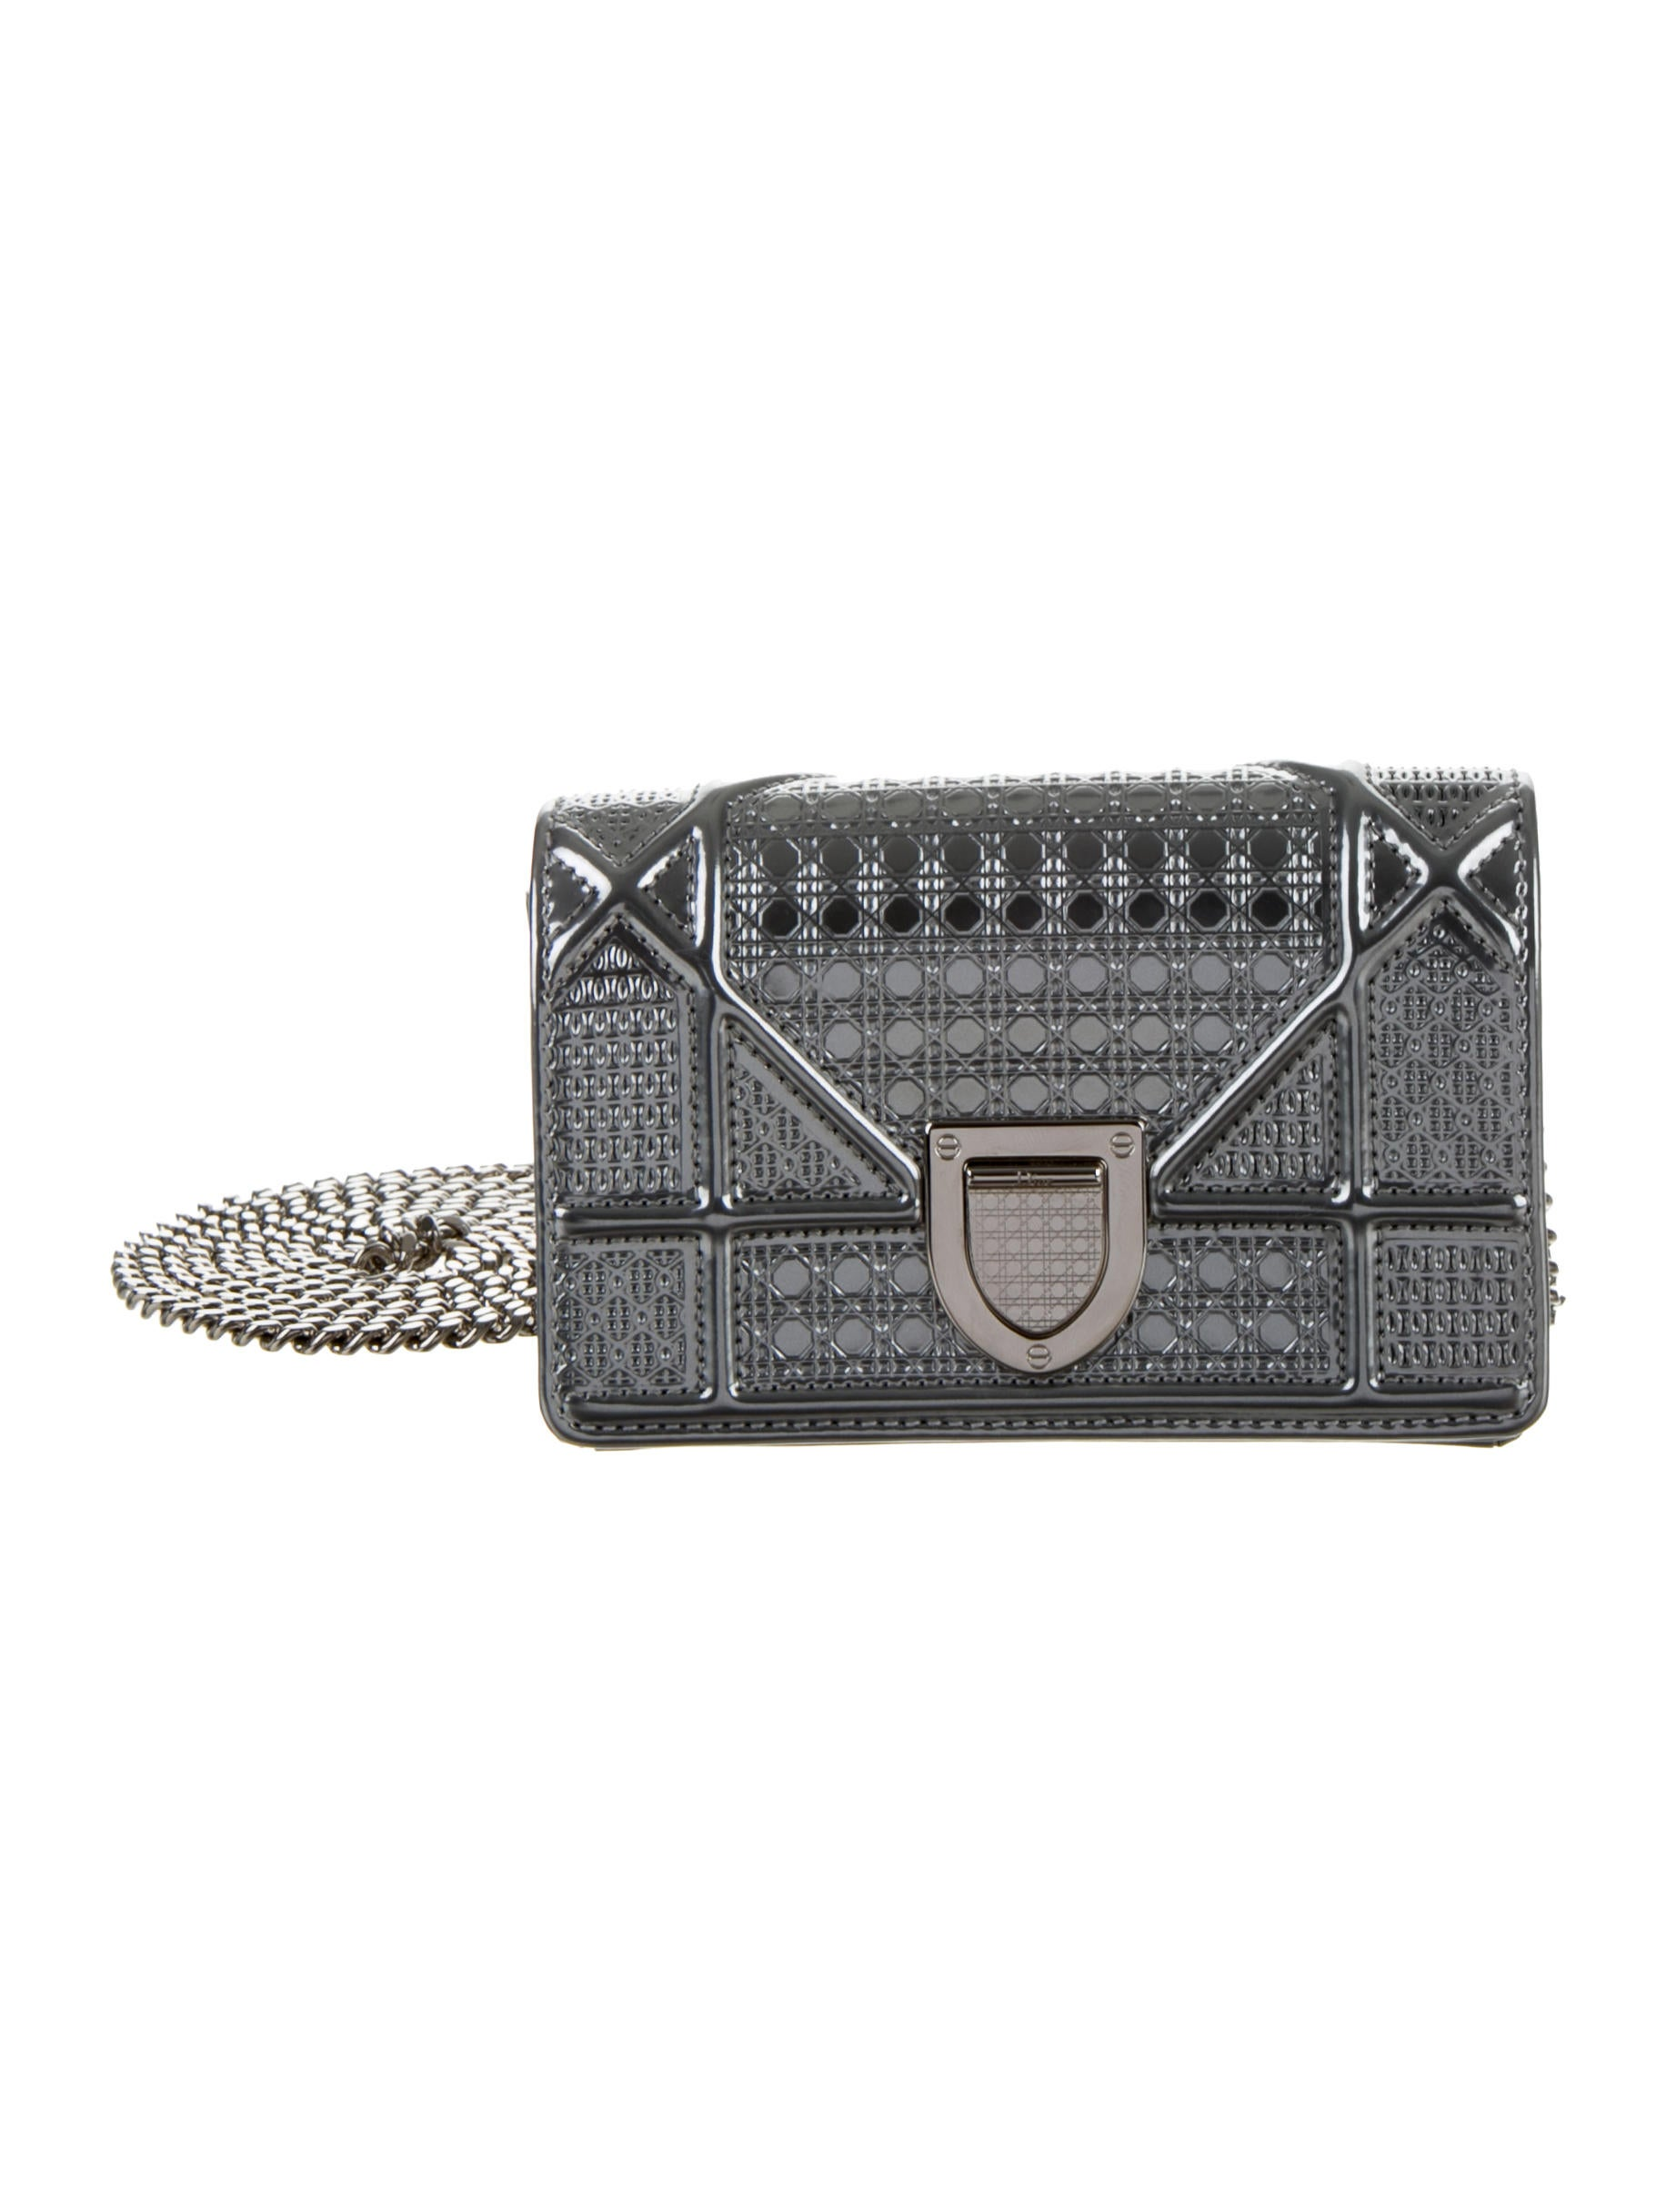 fbfb7b012479 Christian Dior Micro Diorama Flap Bag - Handbags - CHR38913